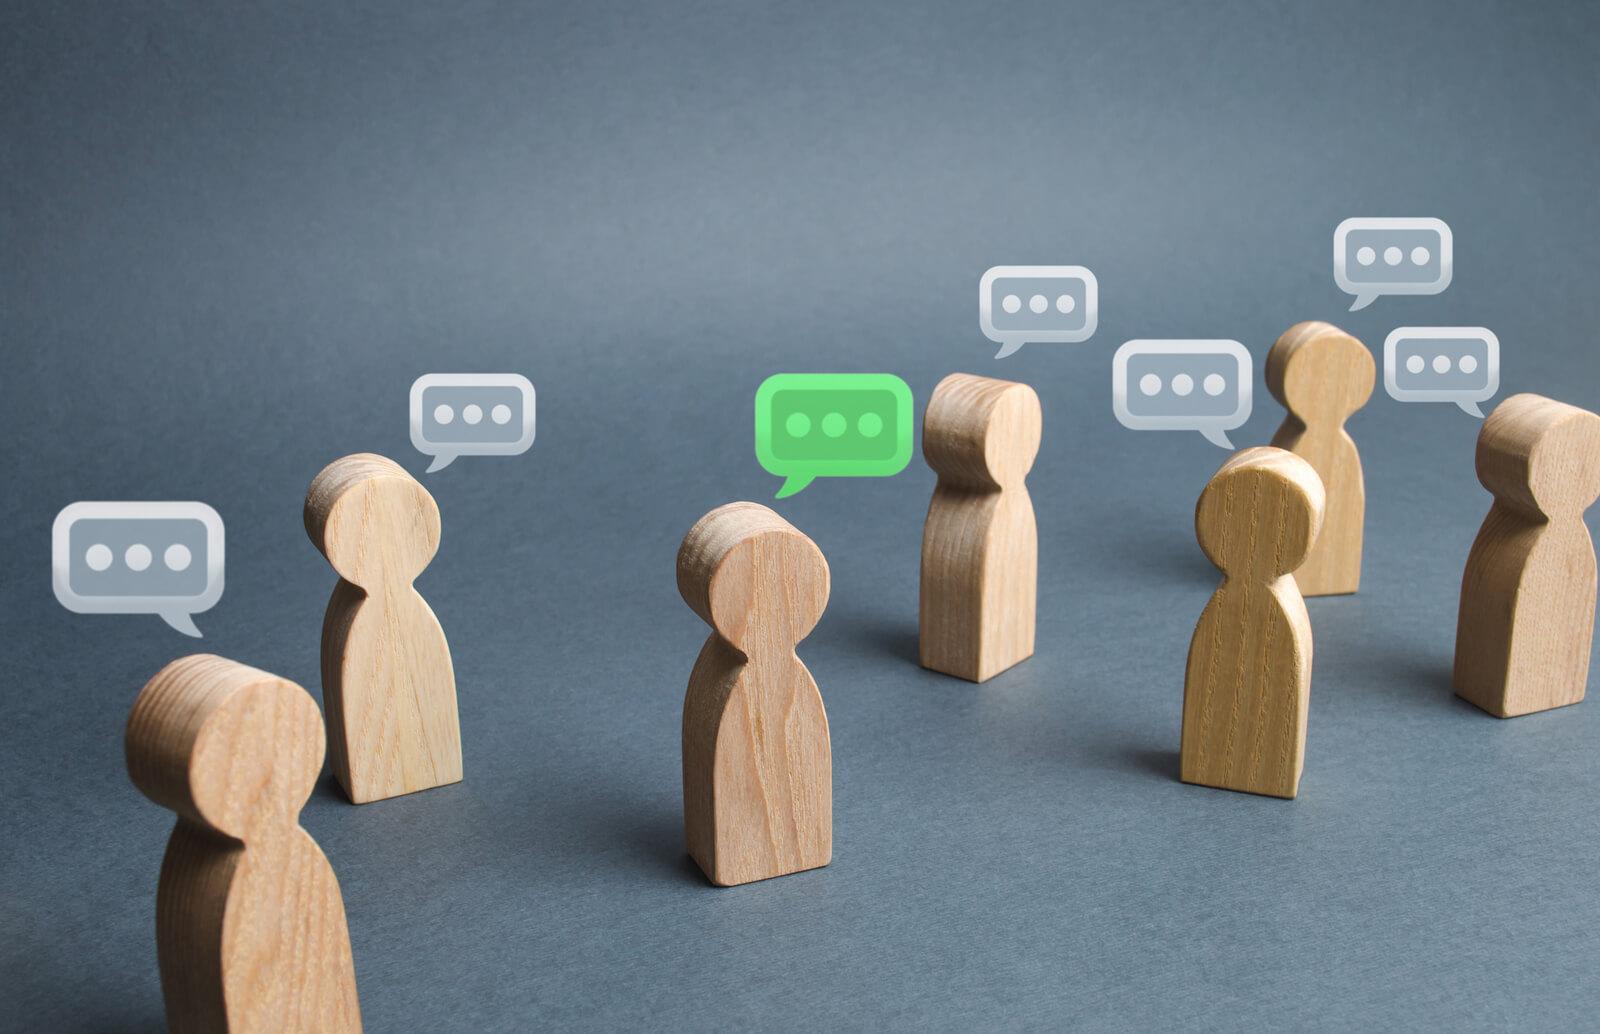 Cuándo dar feedback: retroalimentación previa, simultánea o terminal